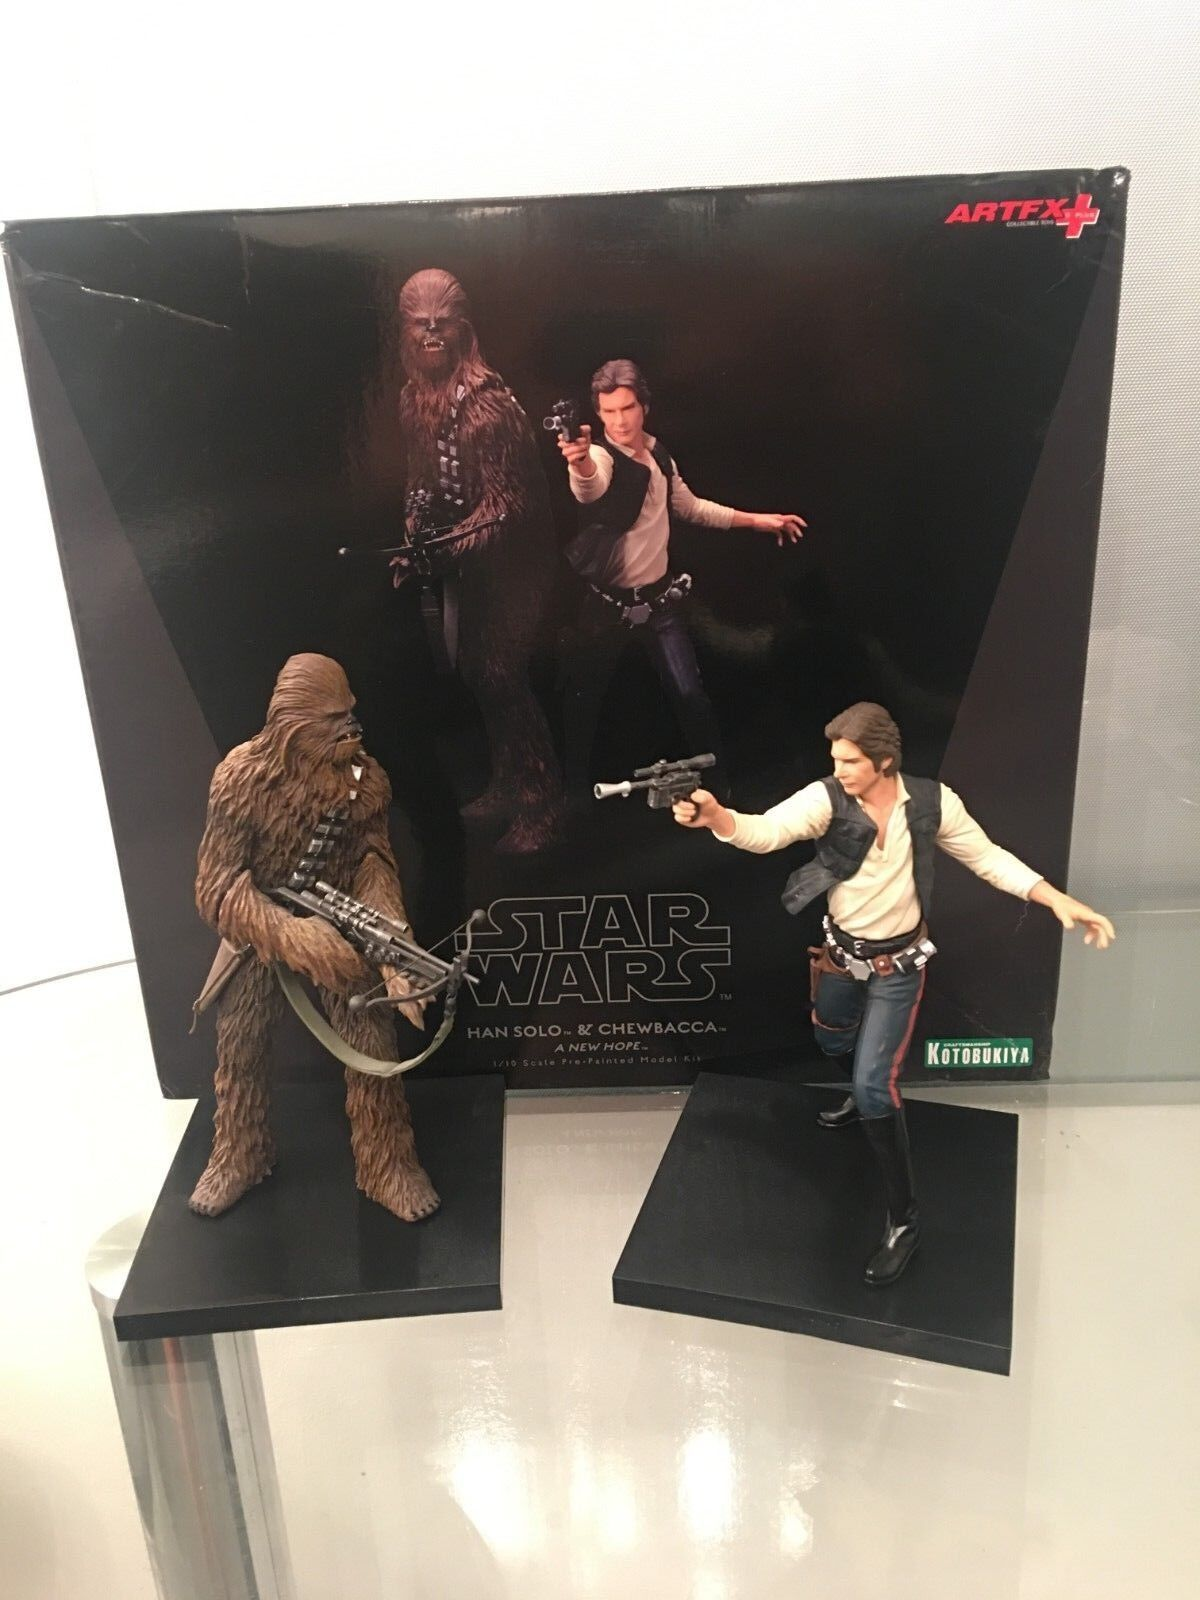 Estrella Wars Han Solo & Chewbacca - A New Hope 2 Pack Kotobukiya ArtFX Collectibles